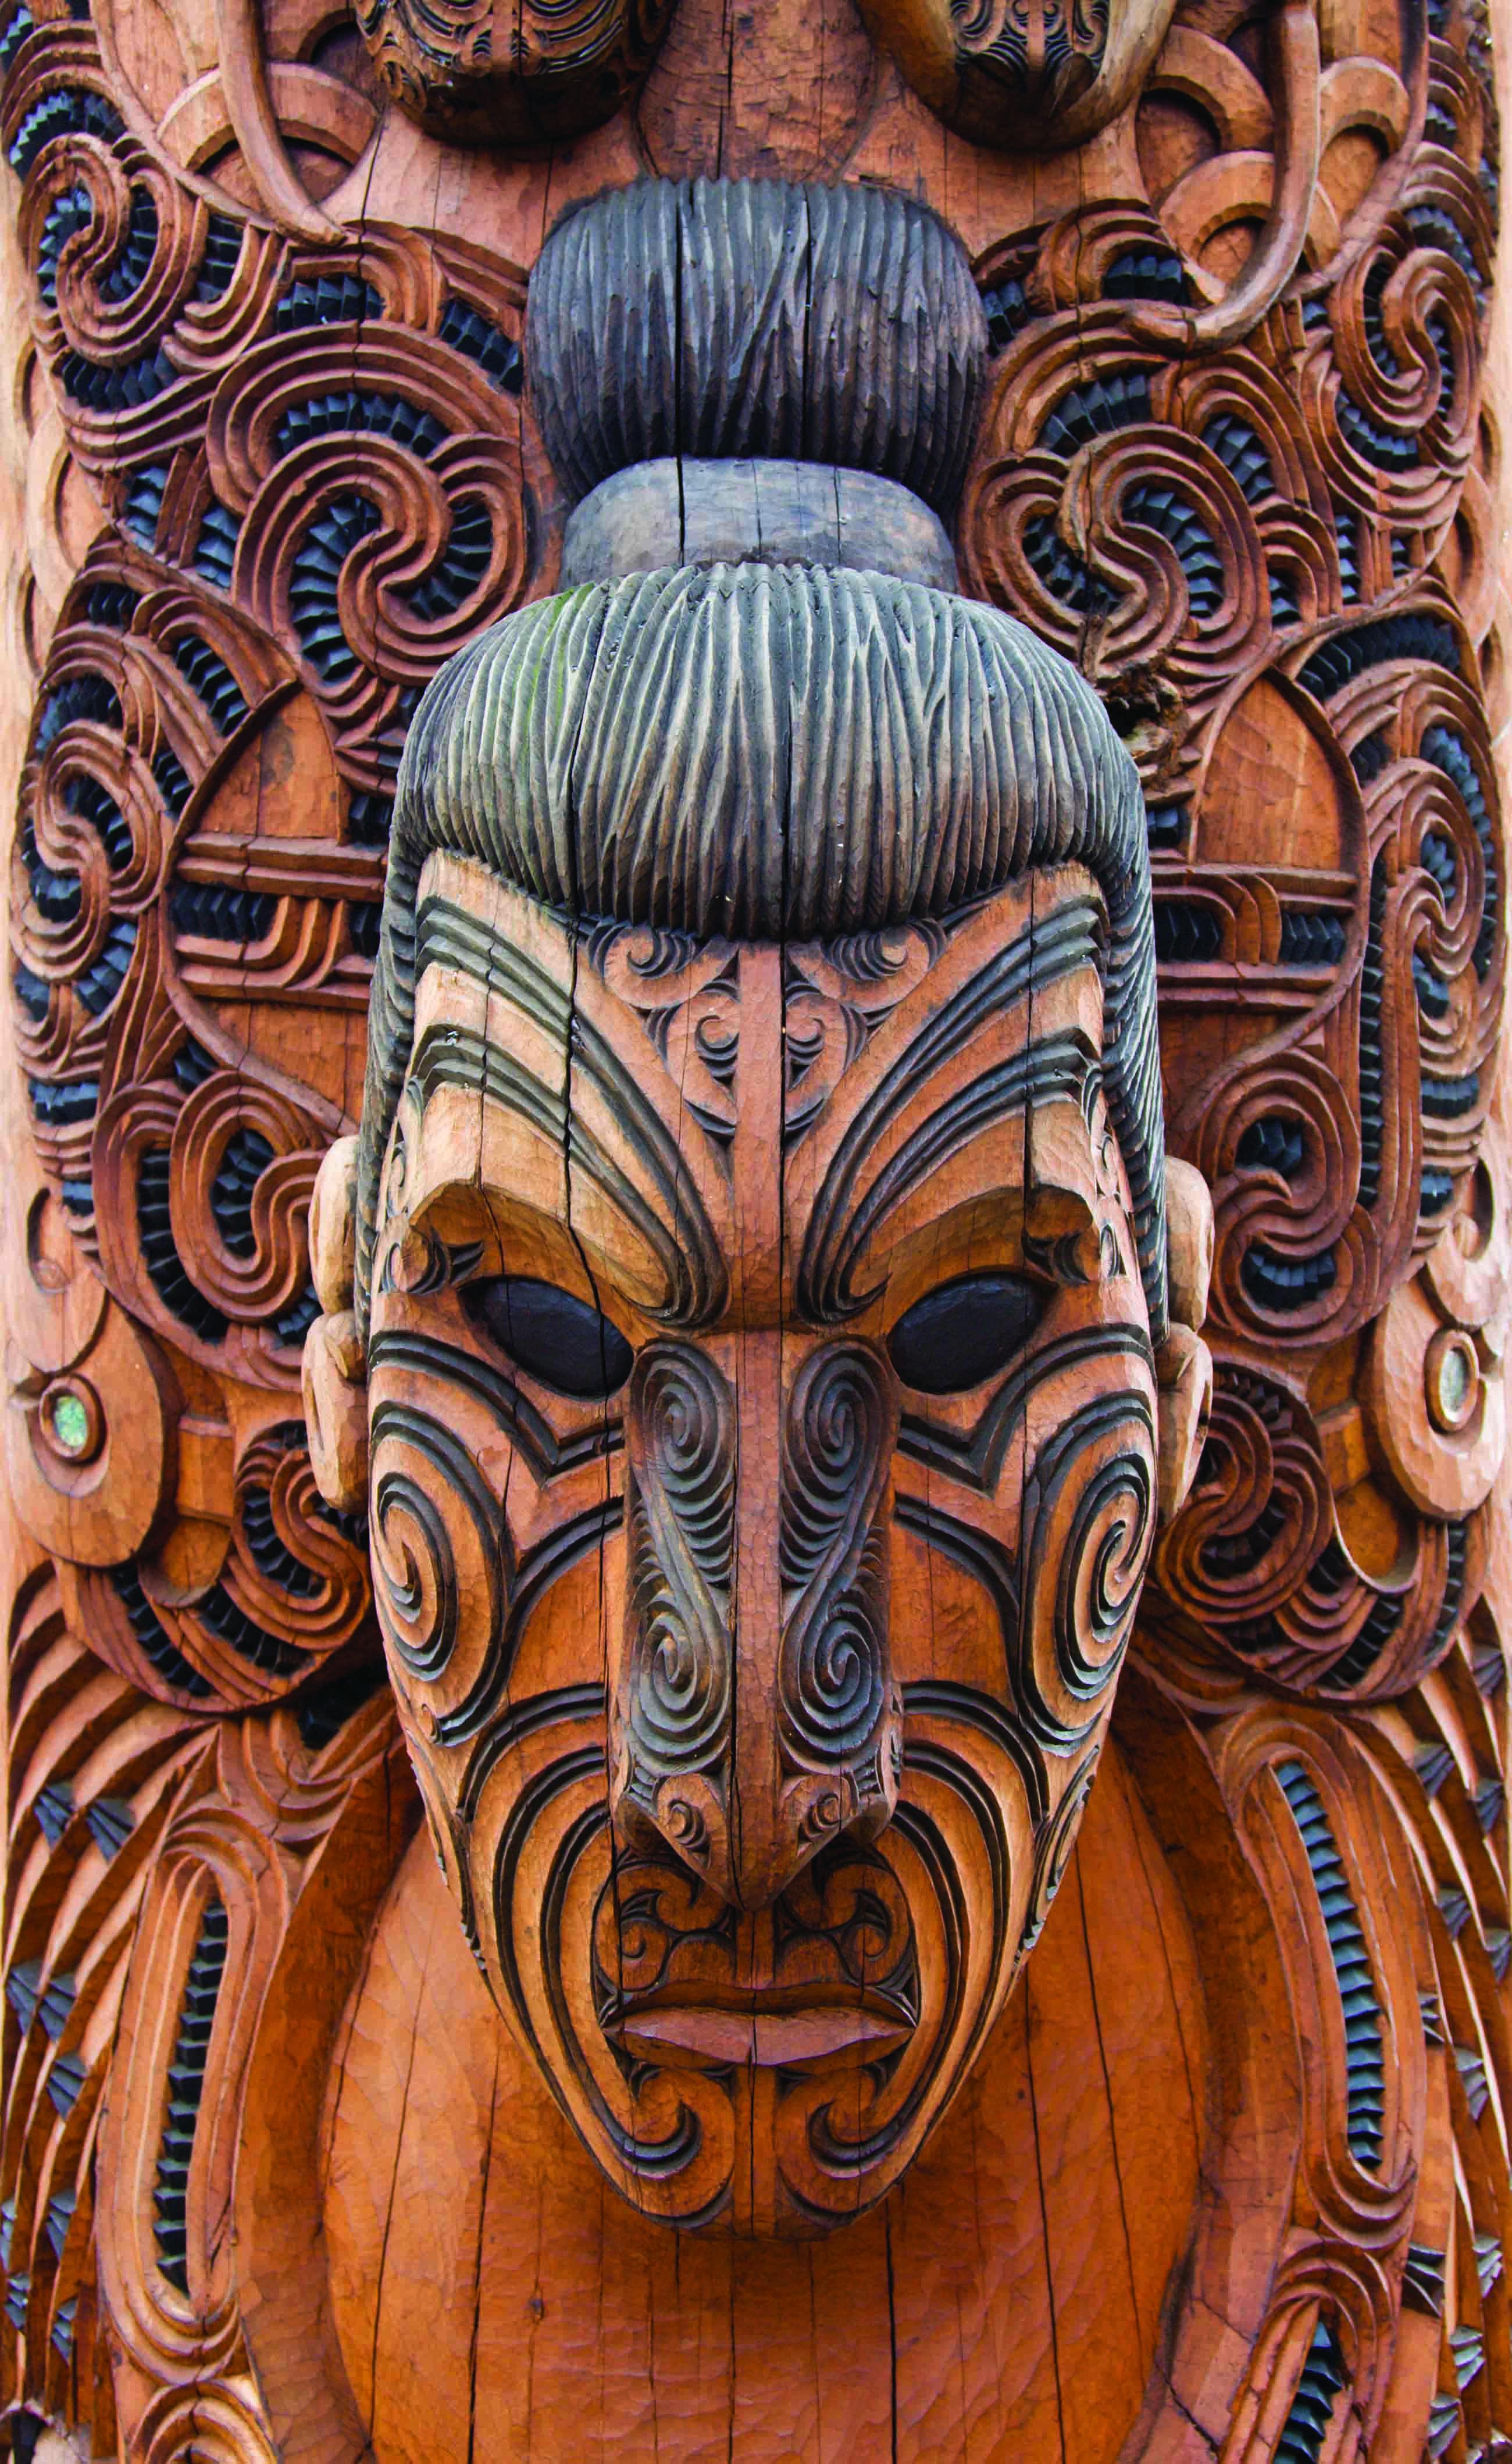 Les sculptures maorie au centre Te Puia à Rotorua